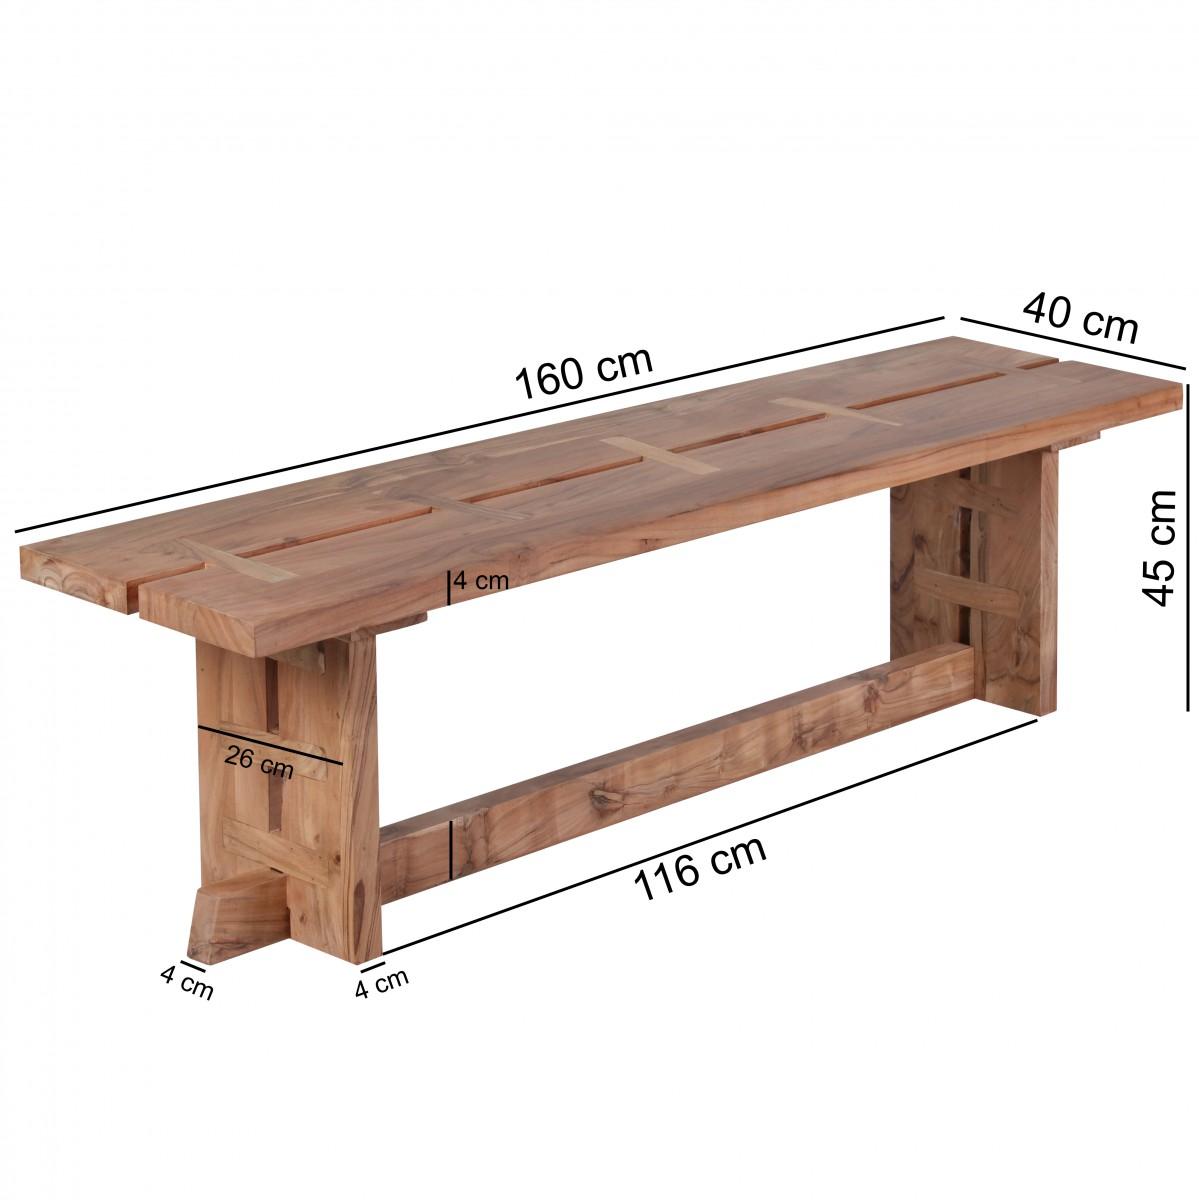 Wohnling salle banc en bois massif acacia banc de cuisine - Banc de cuisine en bois ...